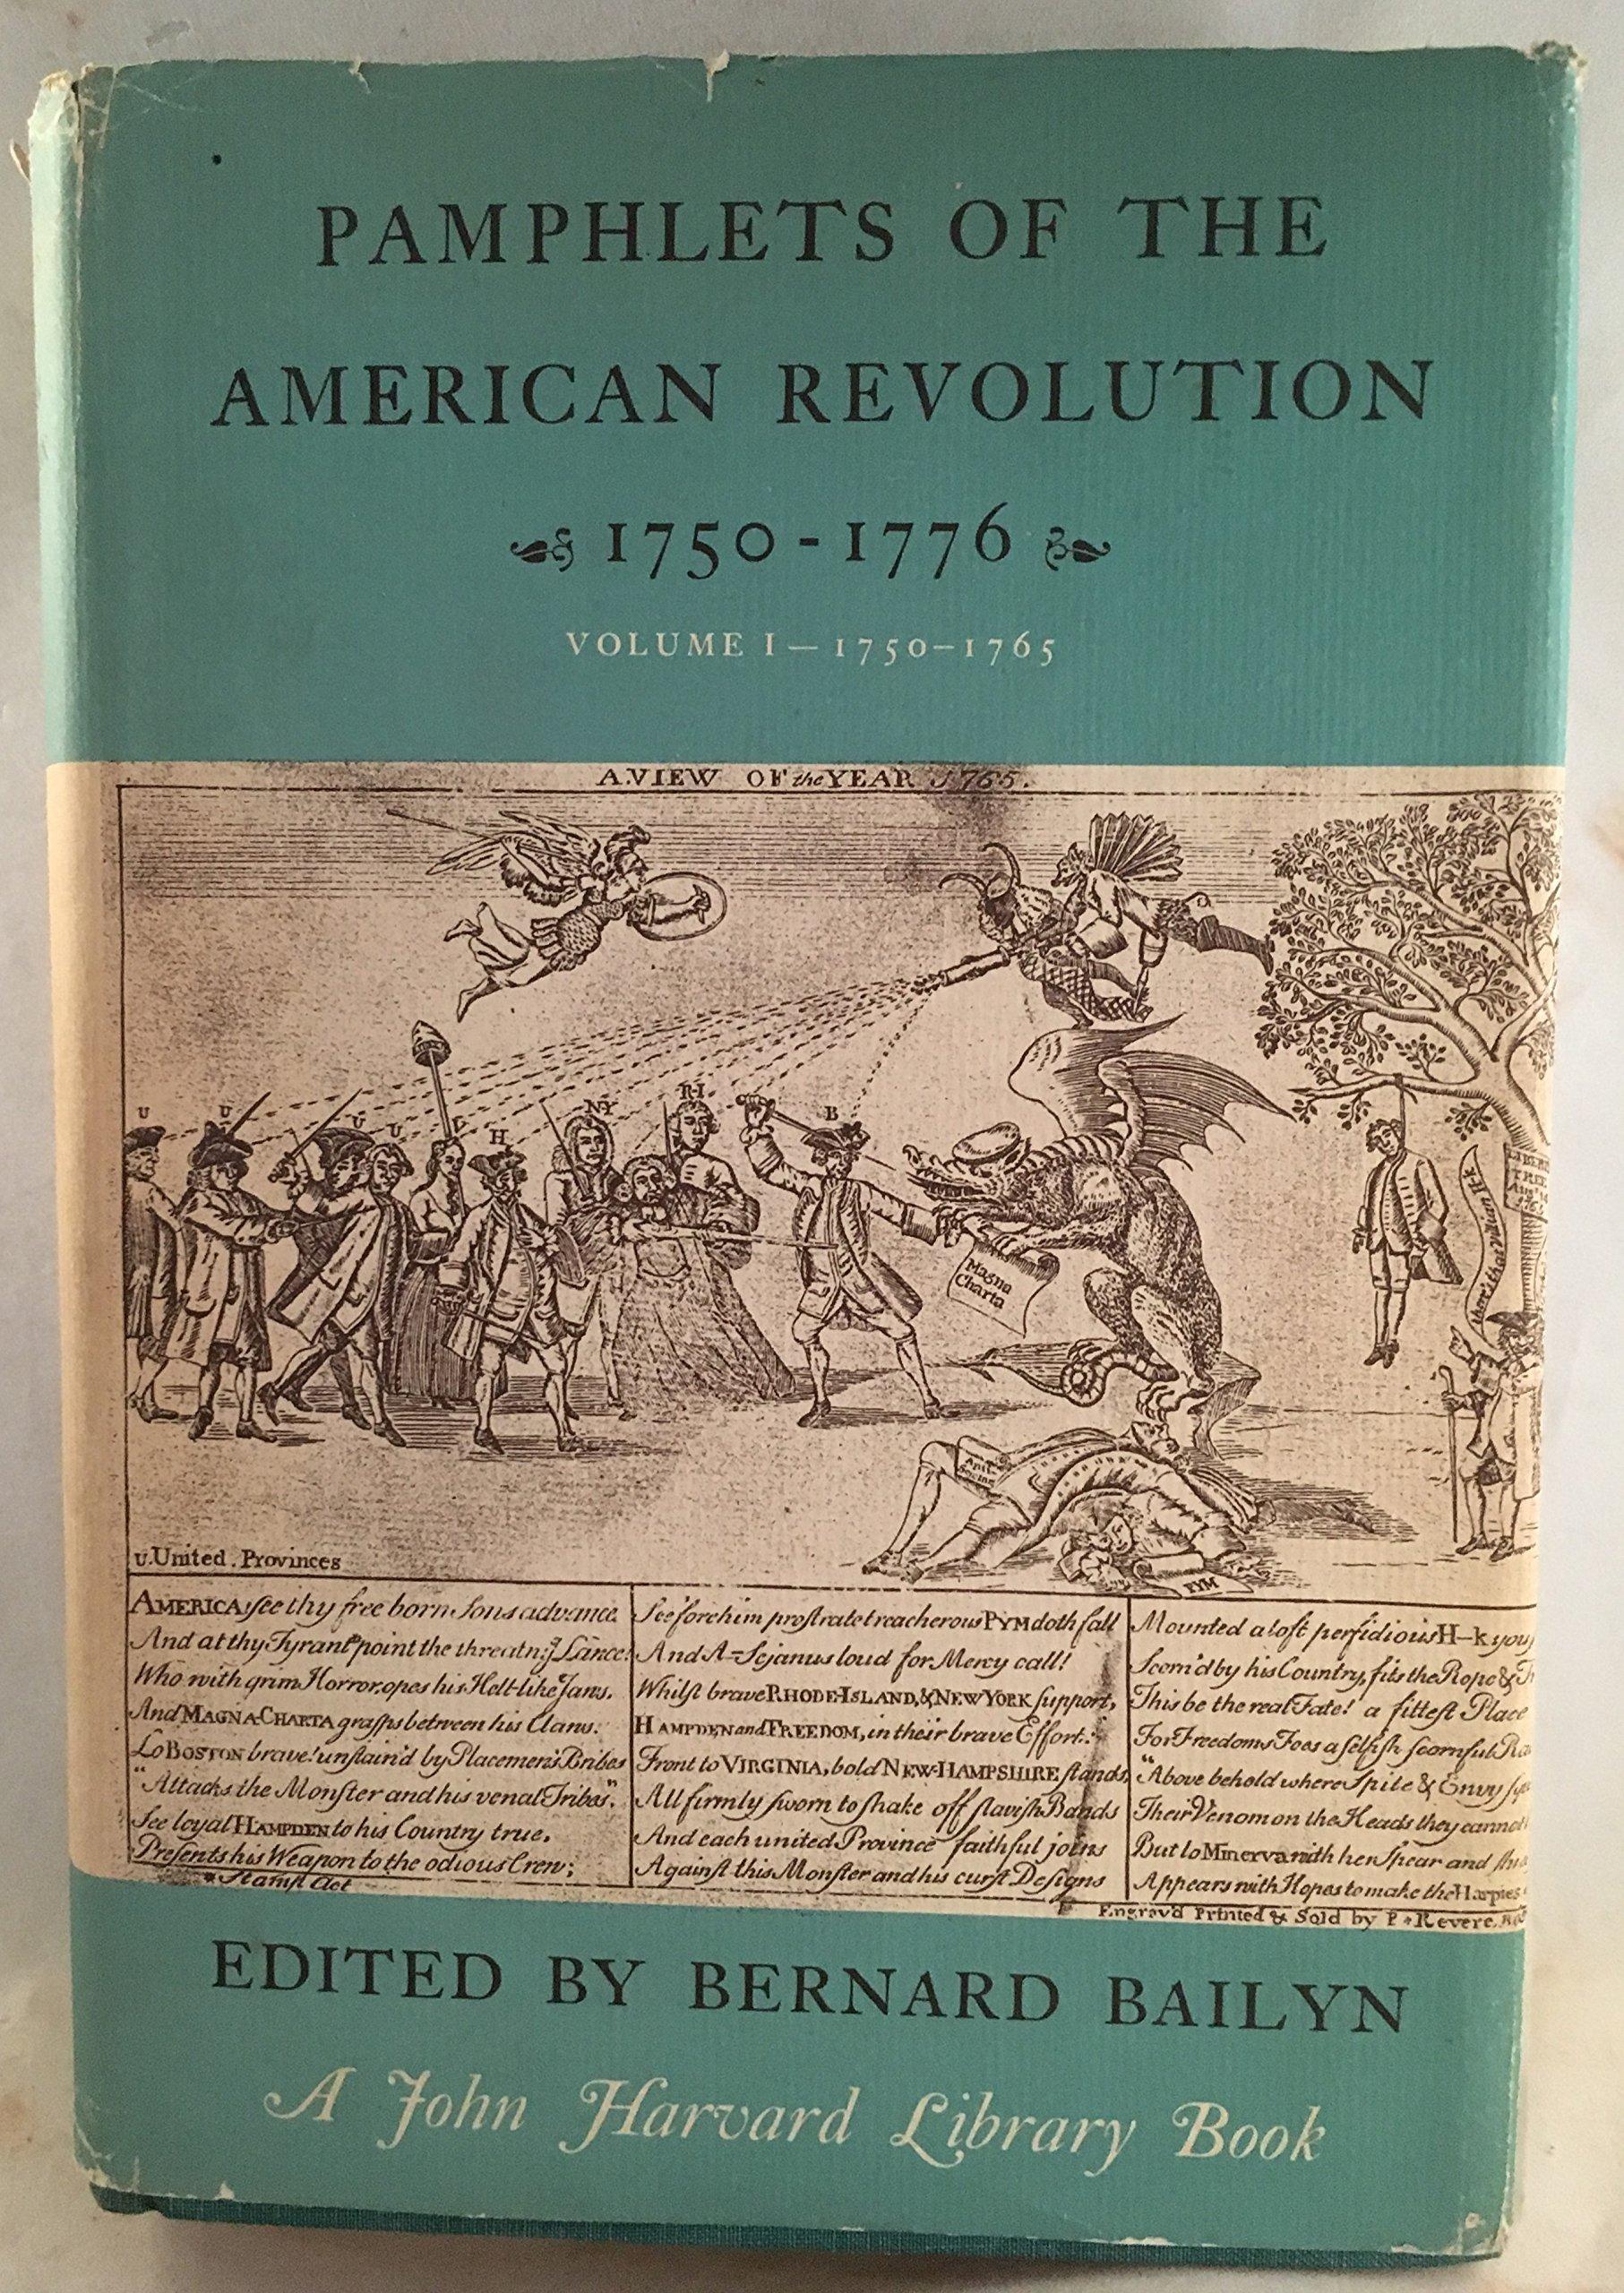 bernard bailyn pamphlets of the american revolution